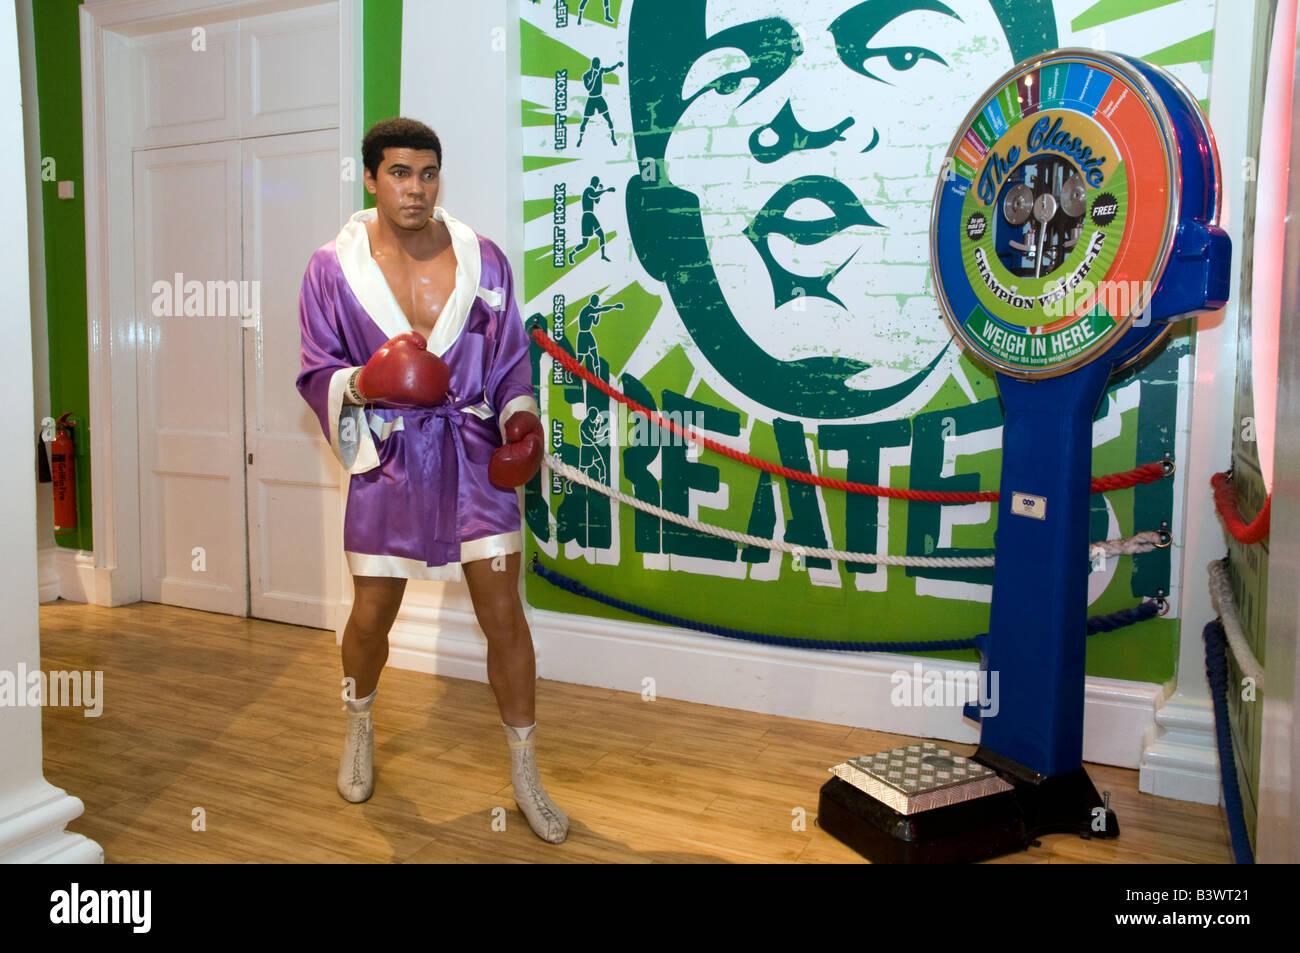 Waxwork model of Muhammad Ali at Madame Tussauds London, UK - Stock Image